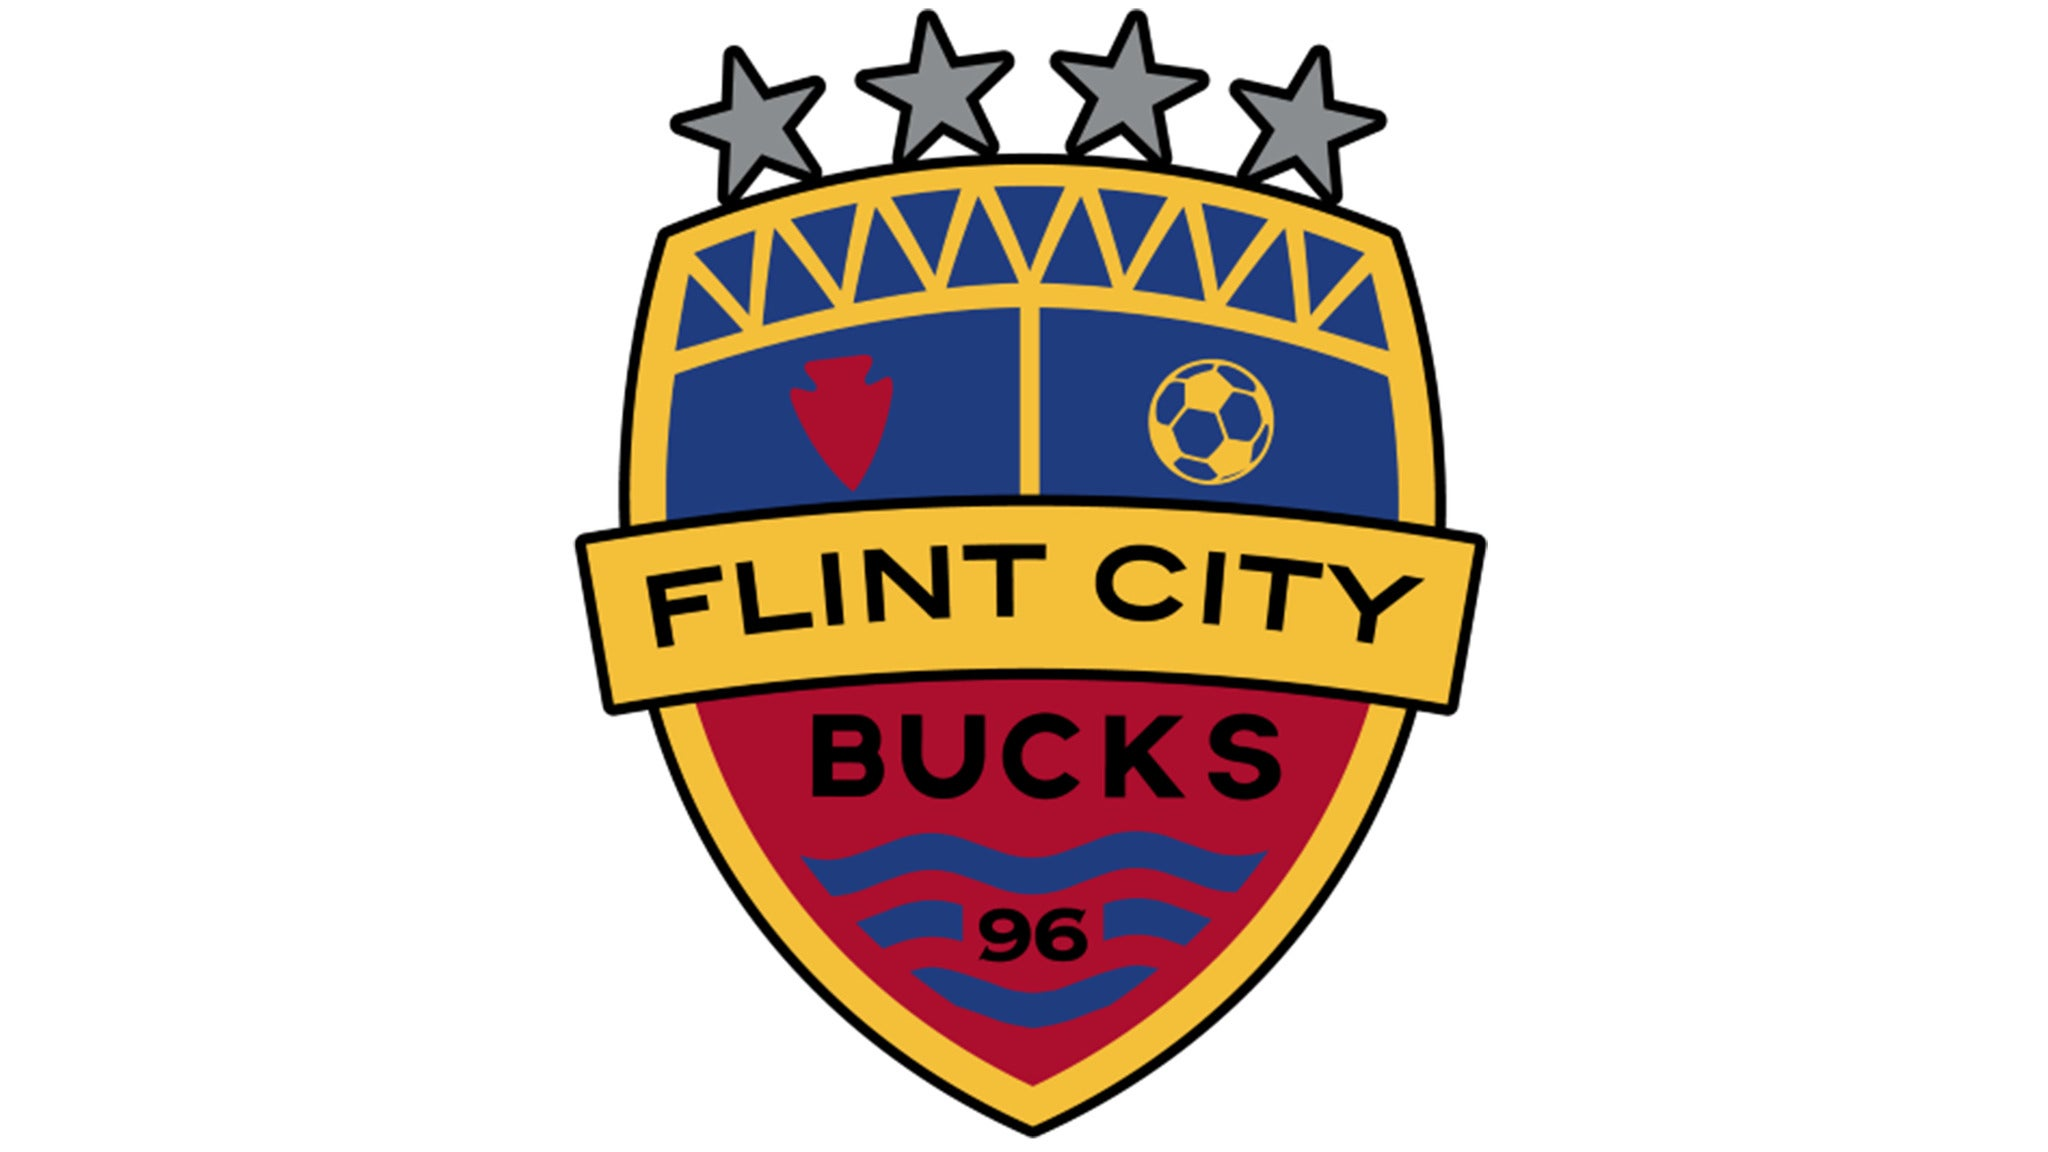 2020 Flint City Bucks Season Tickets